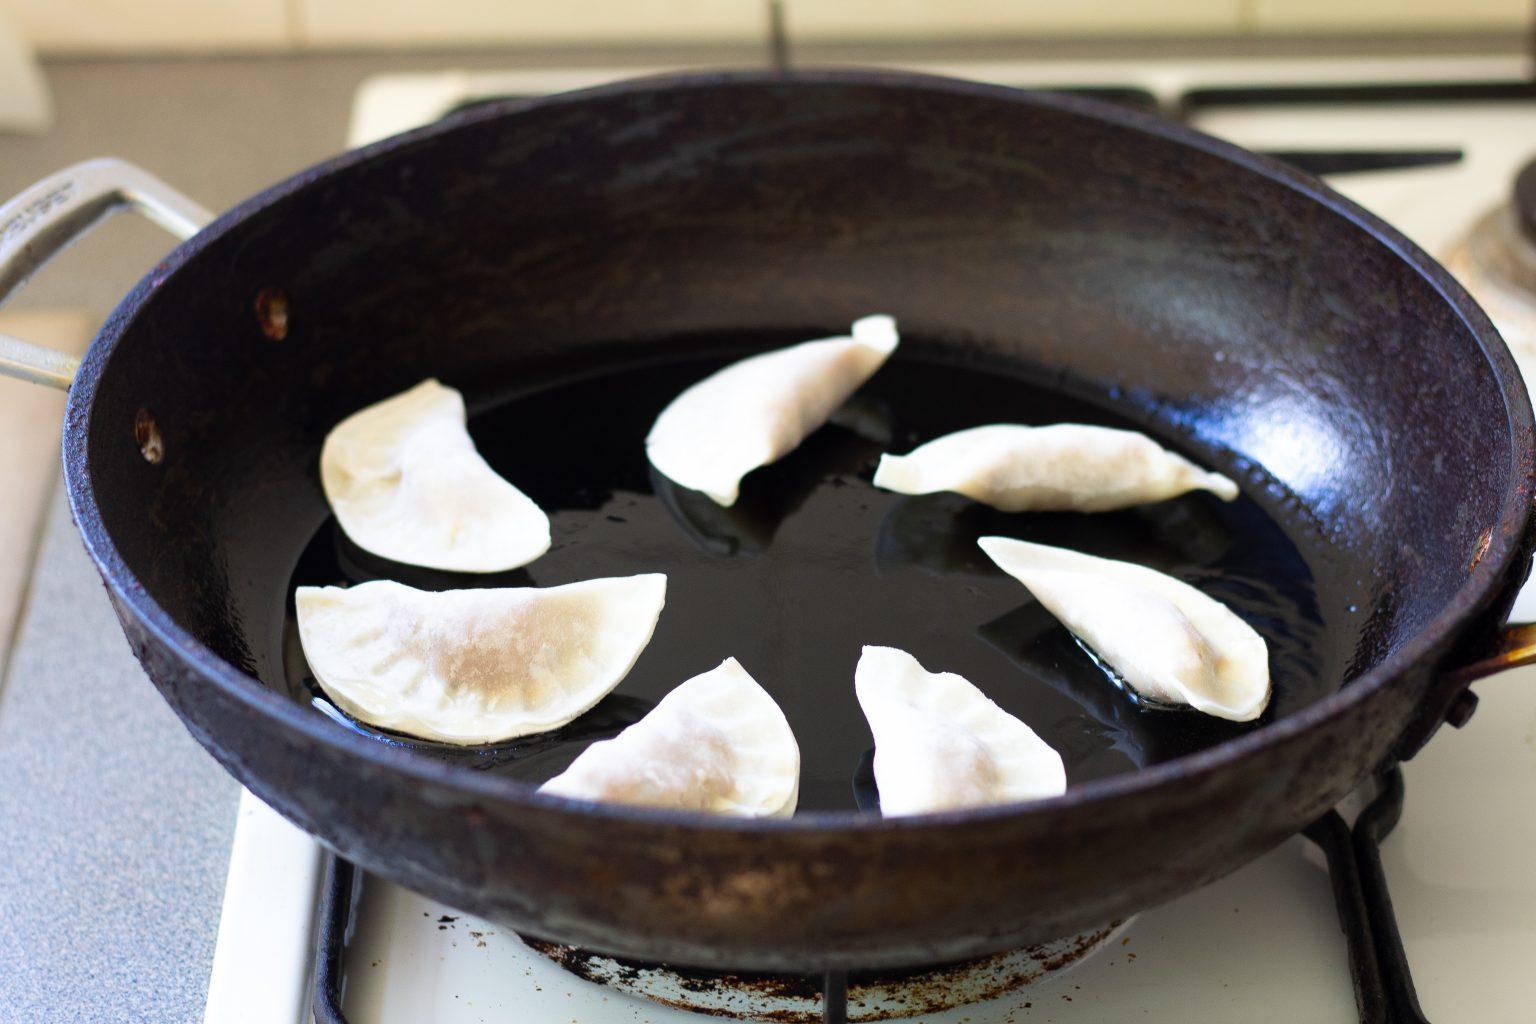 Vegan Dumplings with Coriander and Hoisin Sauce - The MacPherson Diaries